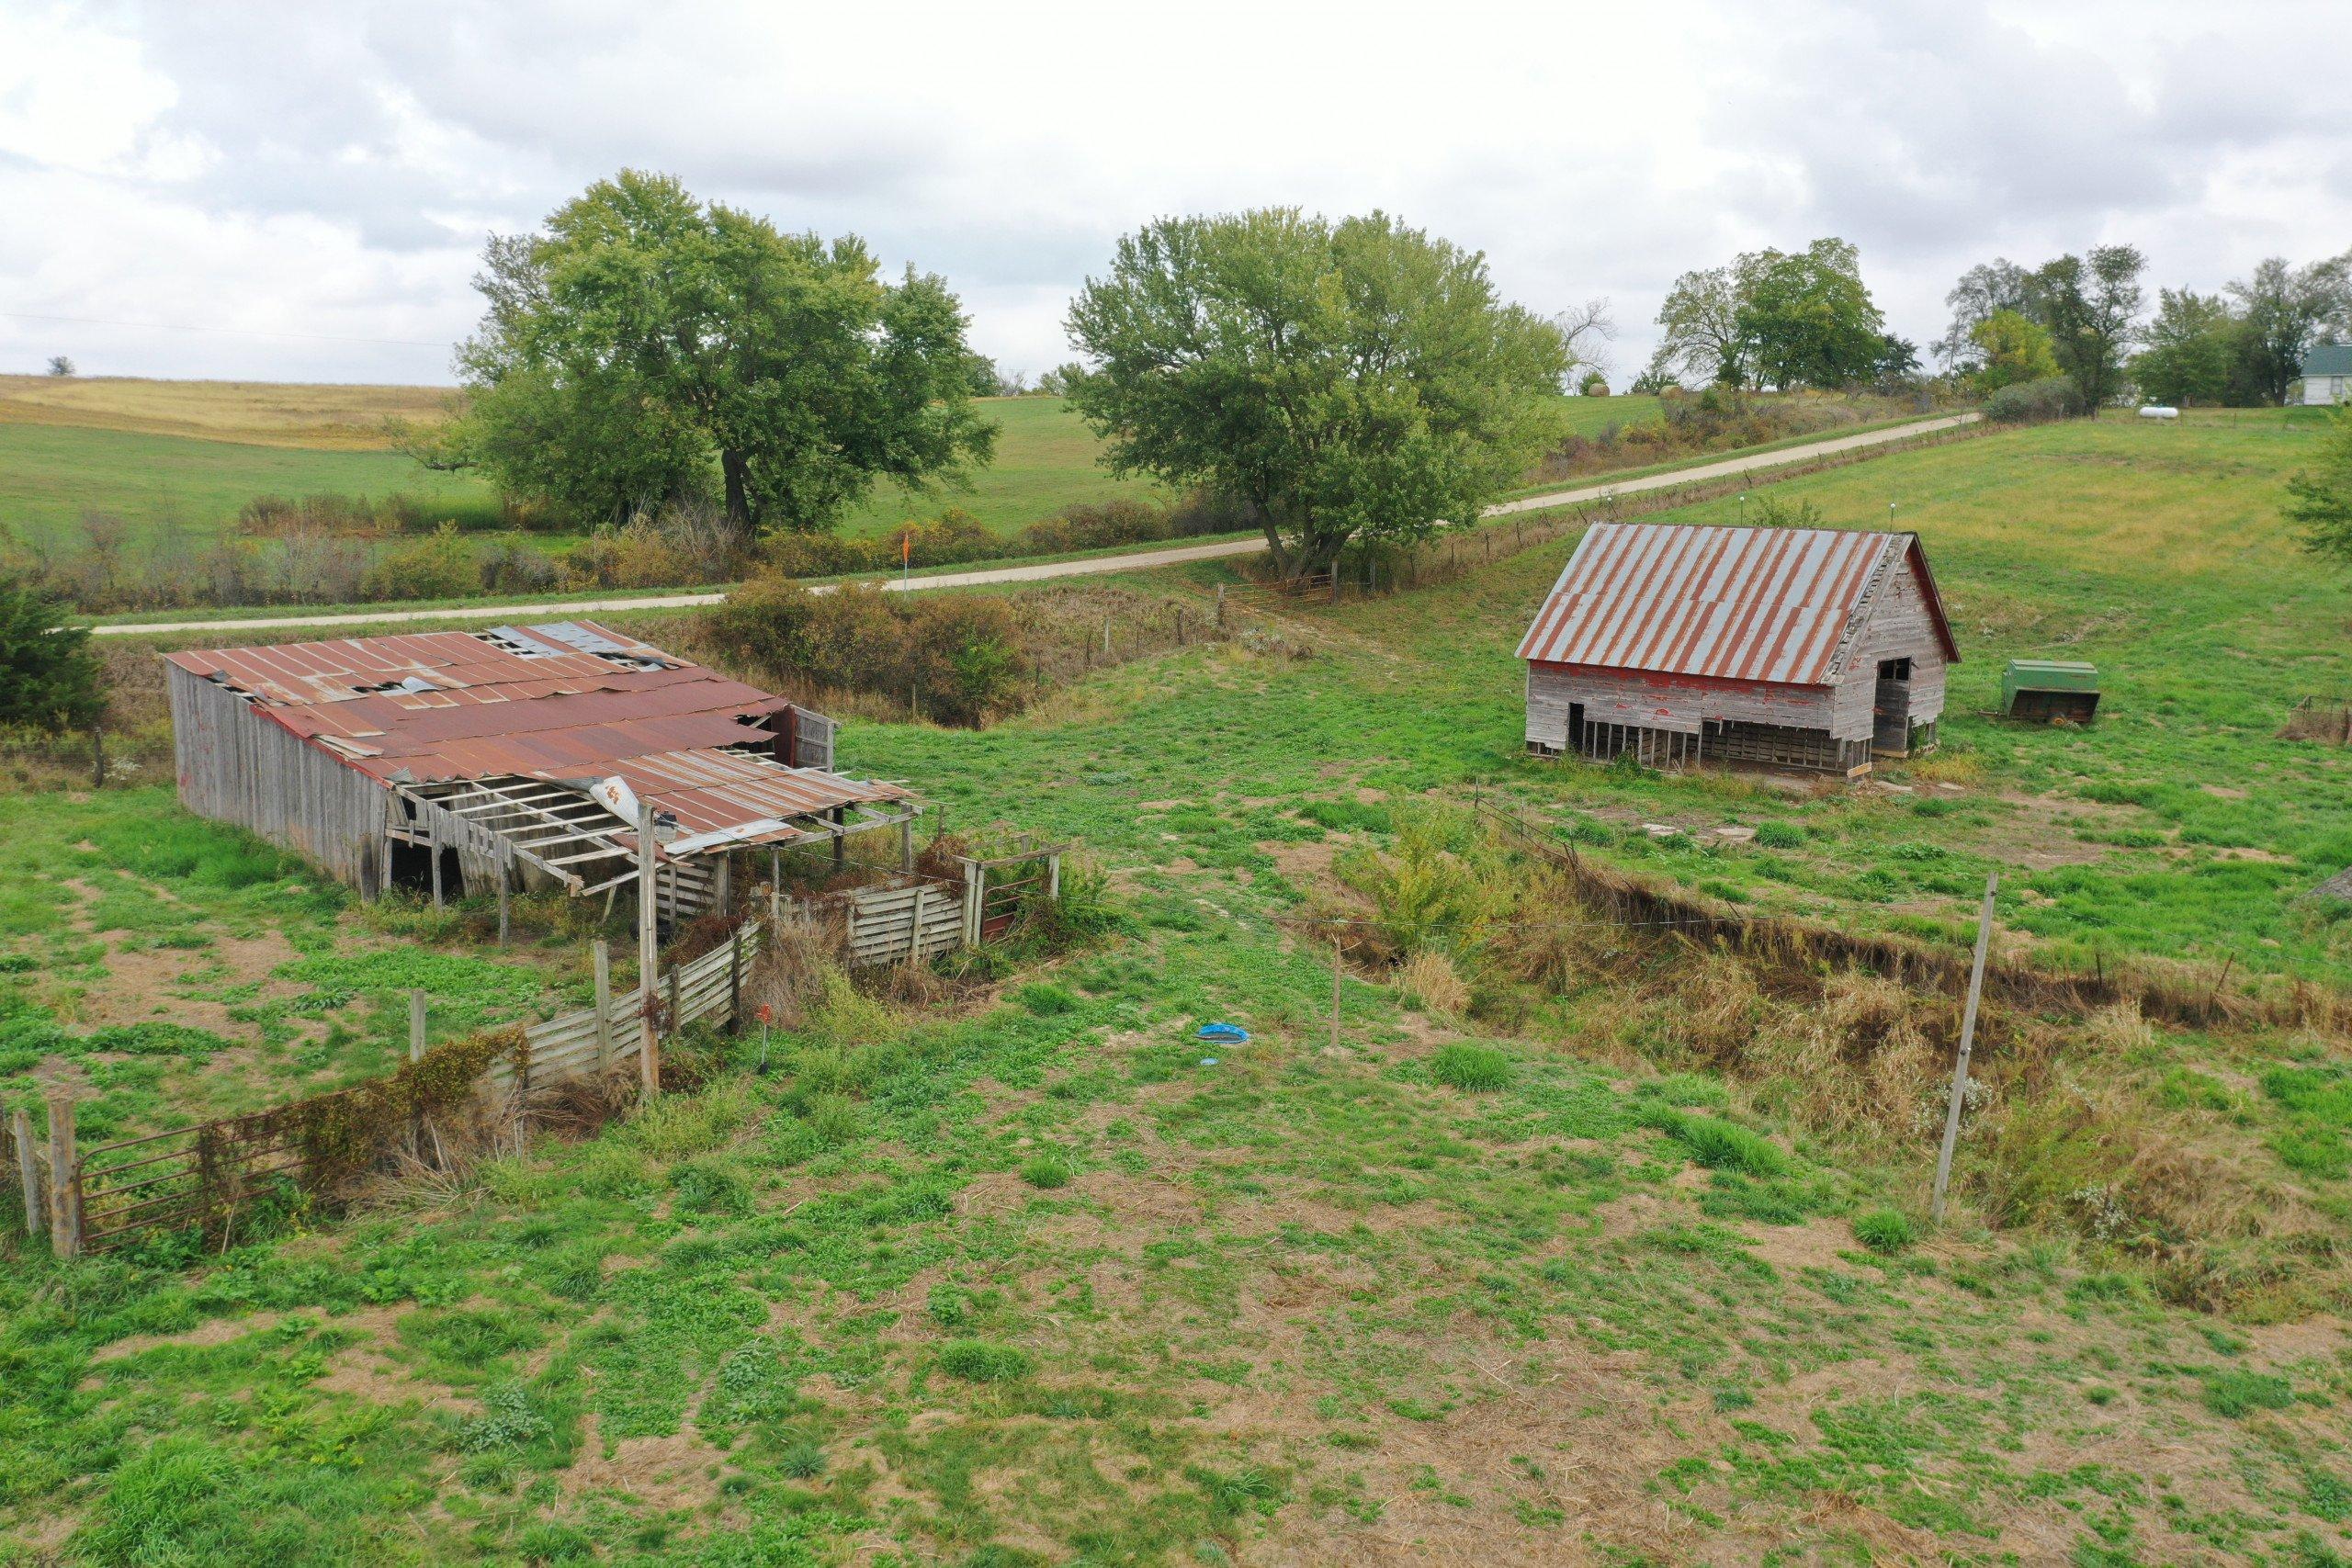 land-warren-county-iowa-200-acres-listing-number-15810-DJI_0616-4.jpg